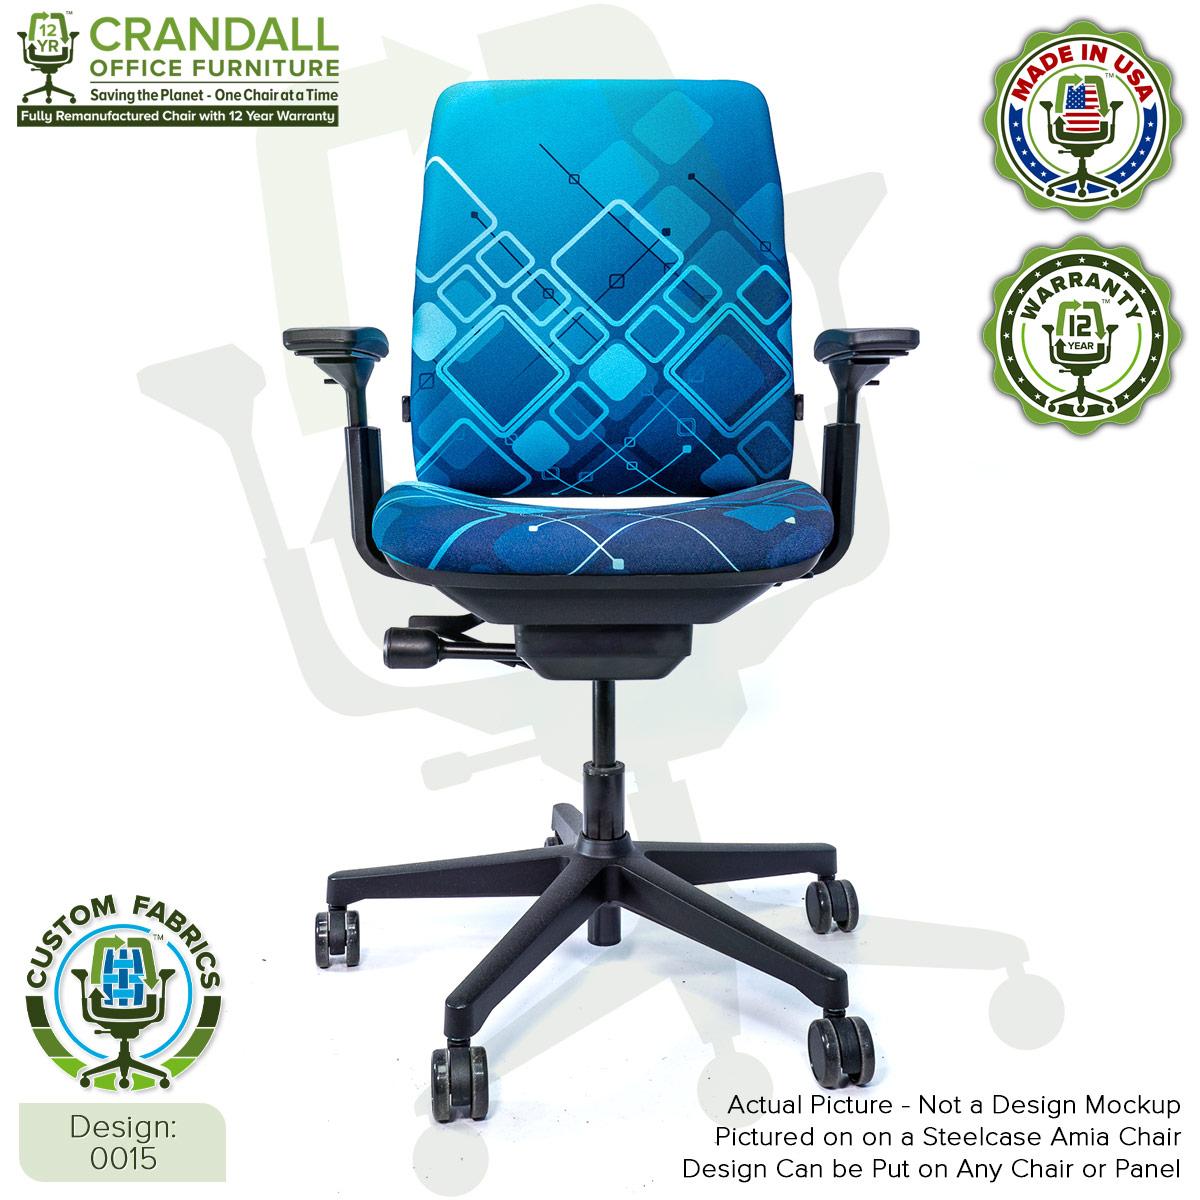 Custom Fabric Remanufactured Steelcase Amia Chair - Design 0015